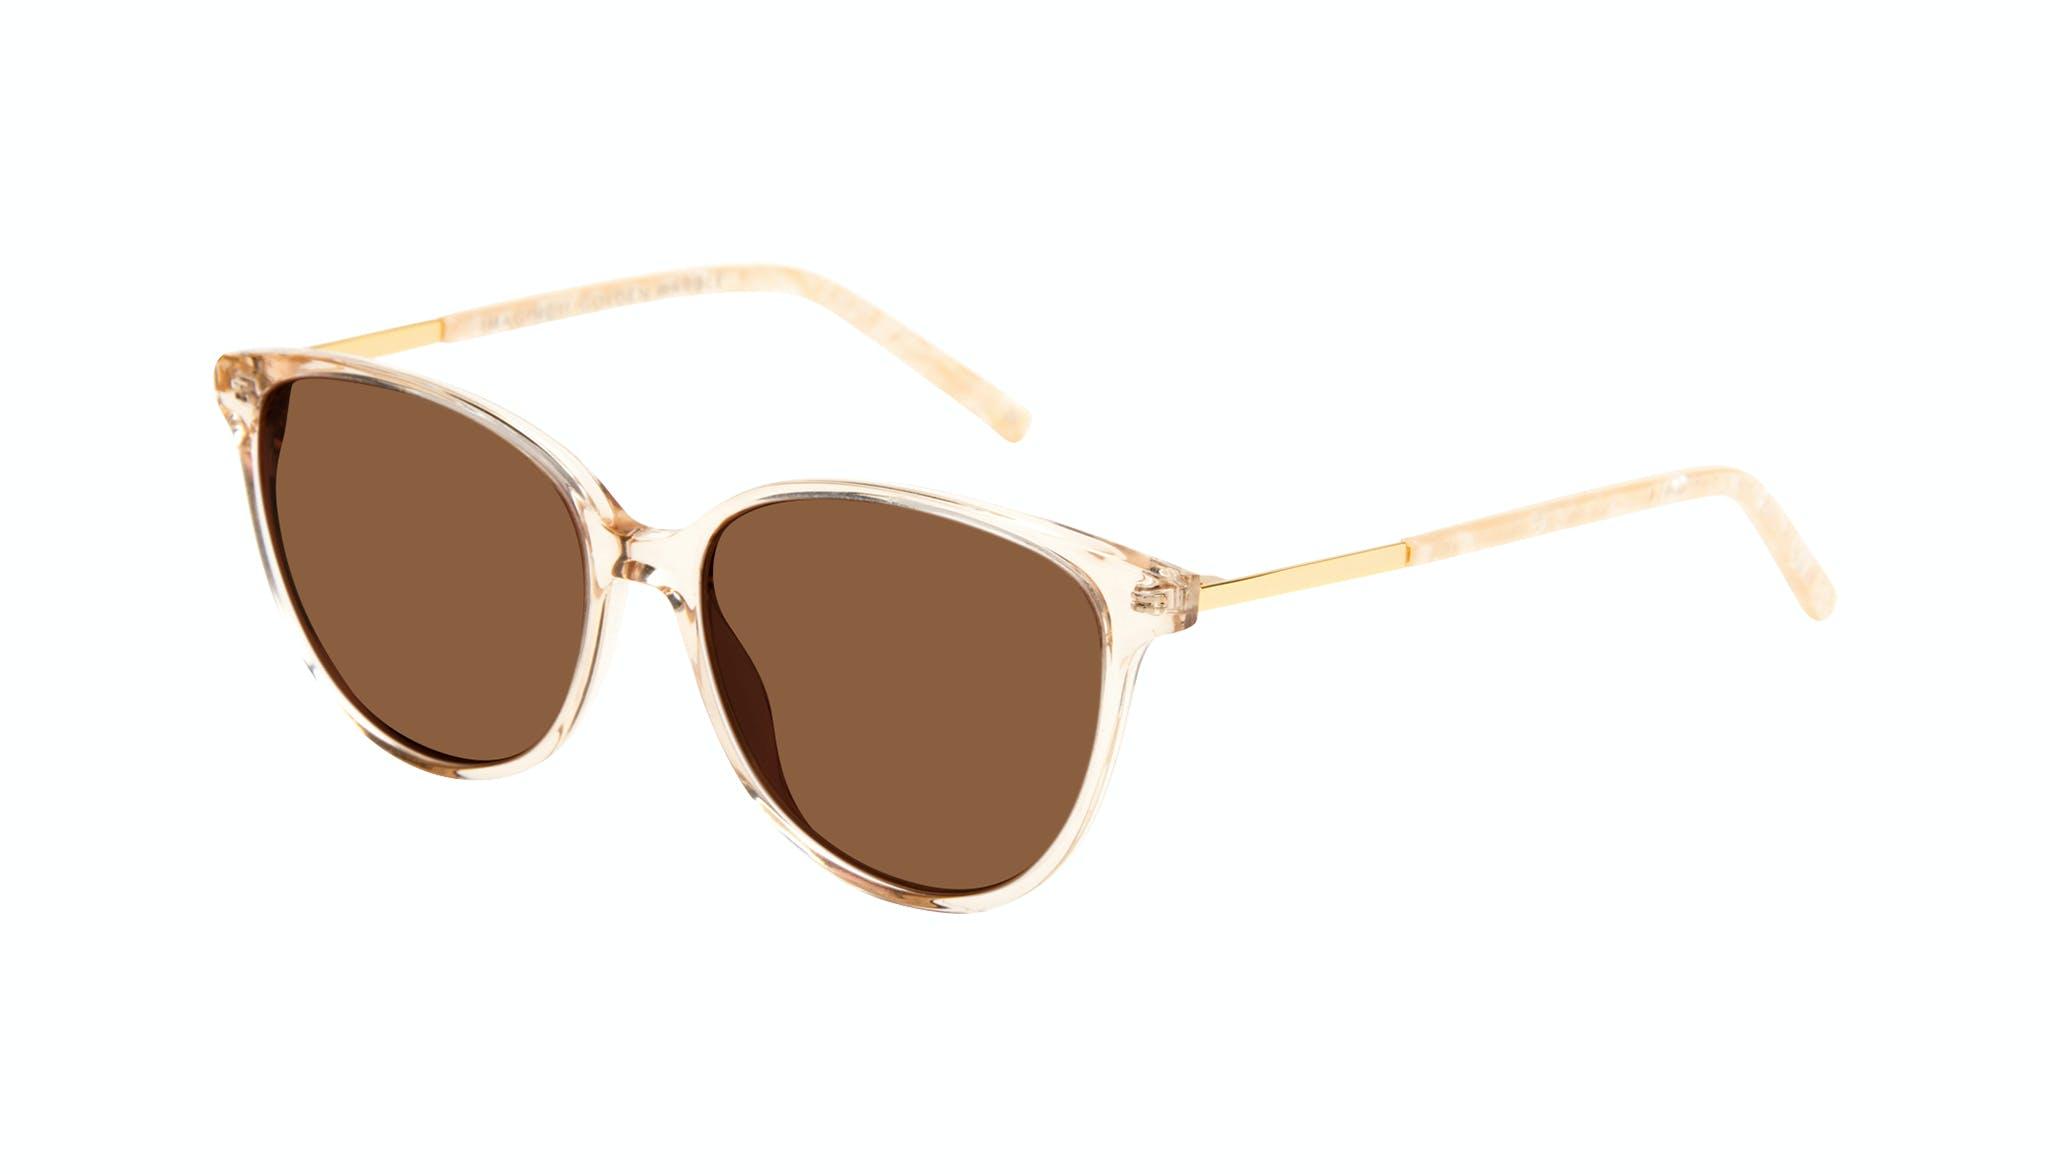 Affordable Fashion Glasses Round Sunglasses Women Imagine II Golden Marble Tilt